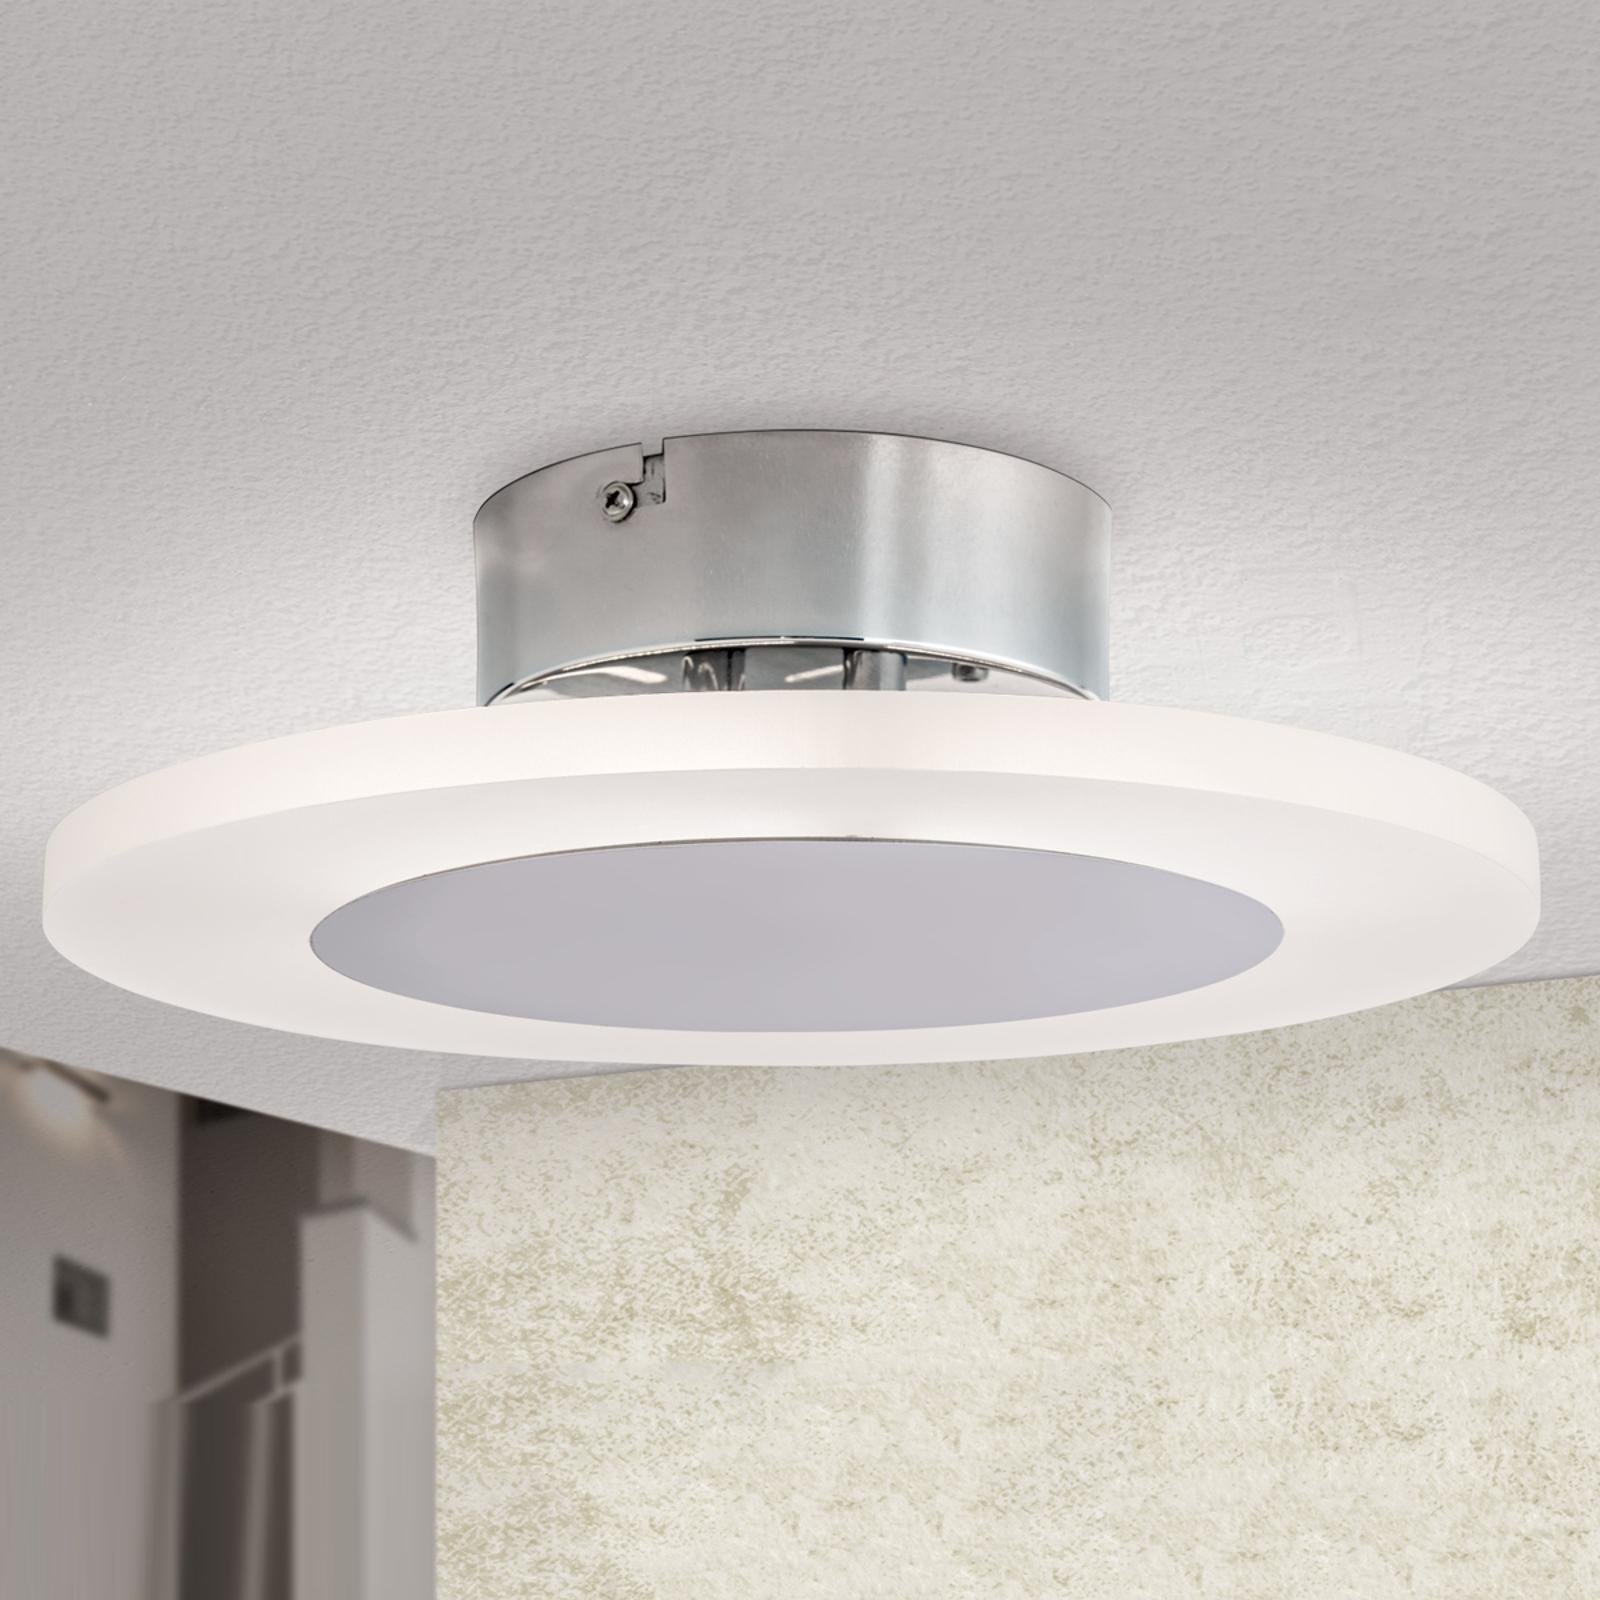 LED plafondlamp Karia rond, 30 cm